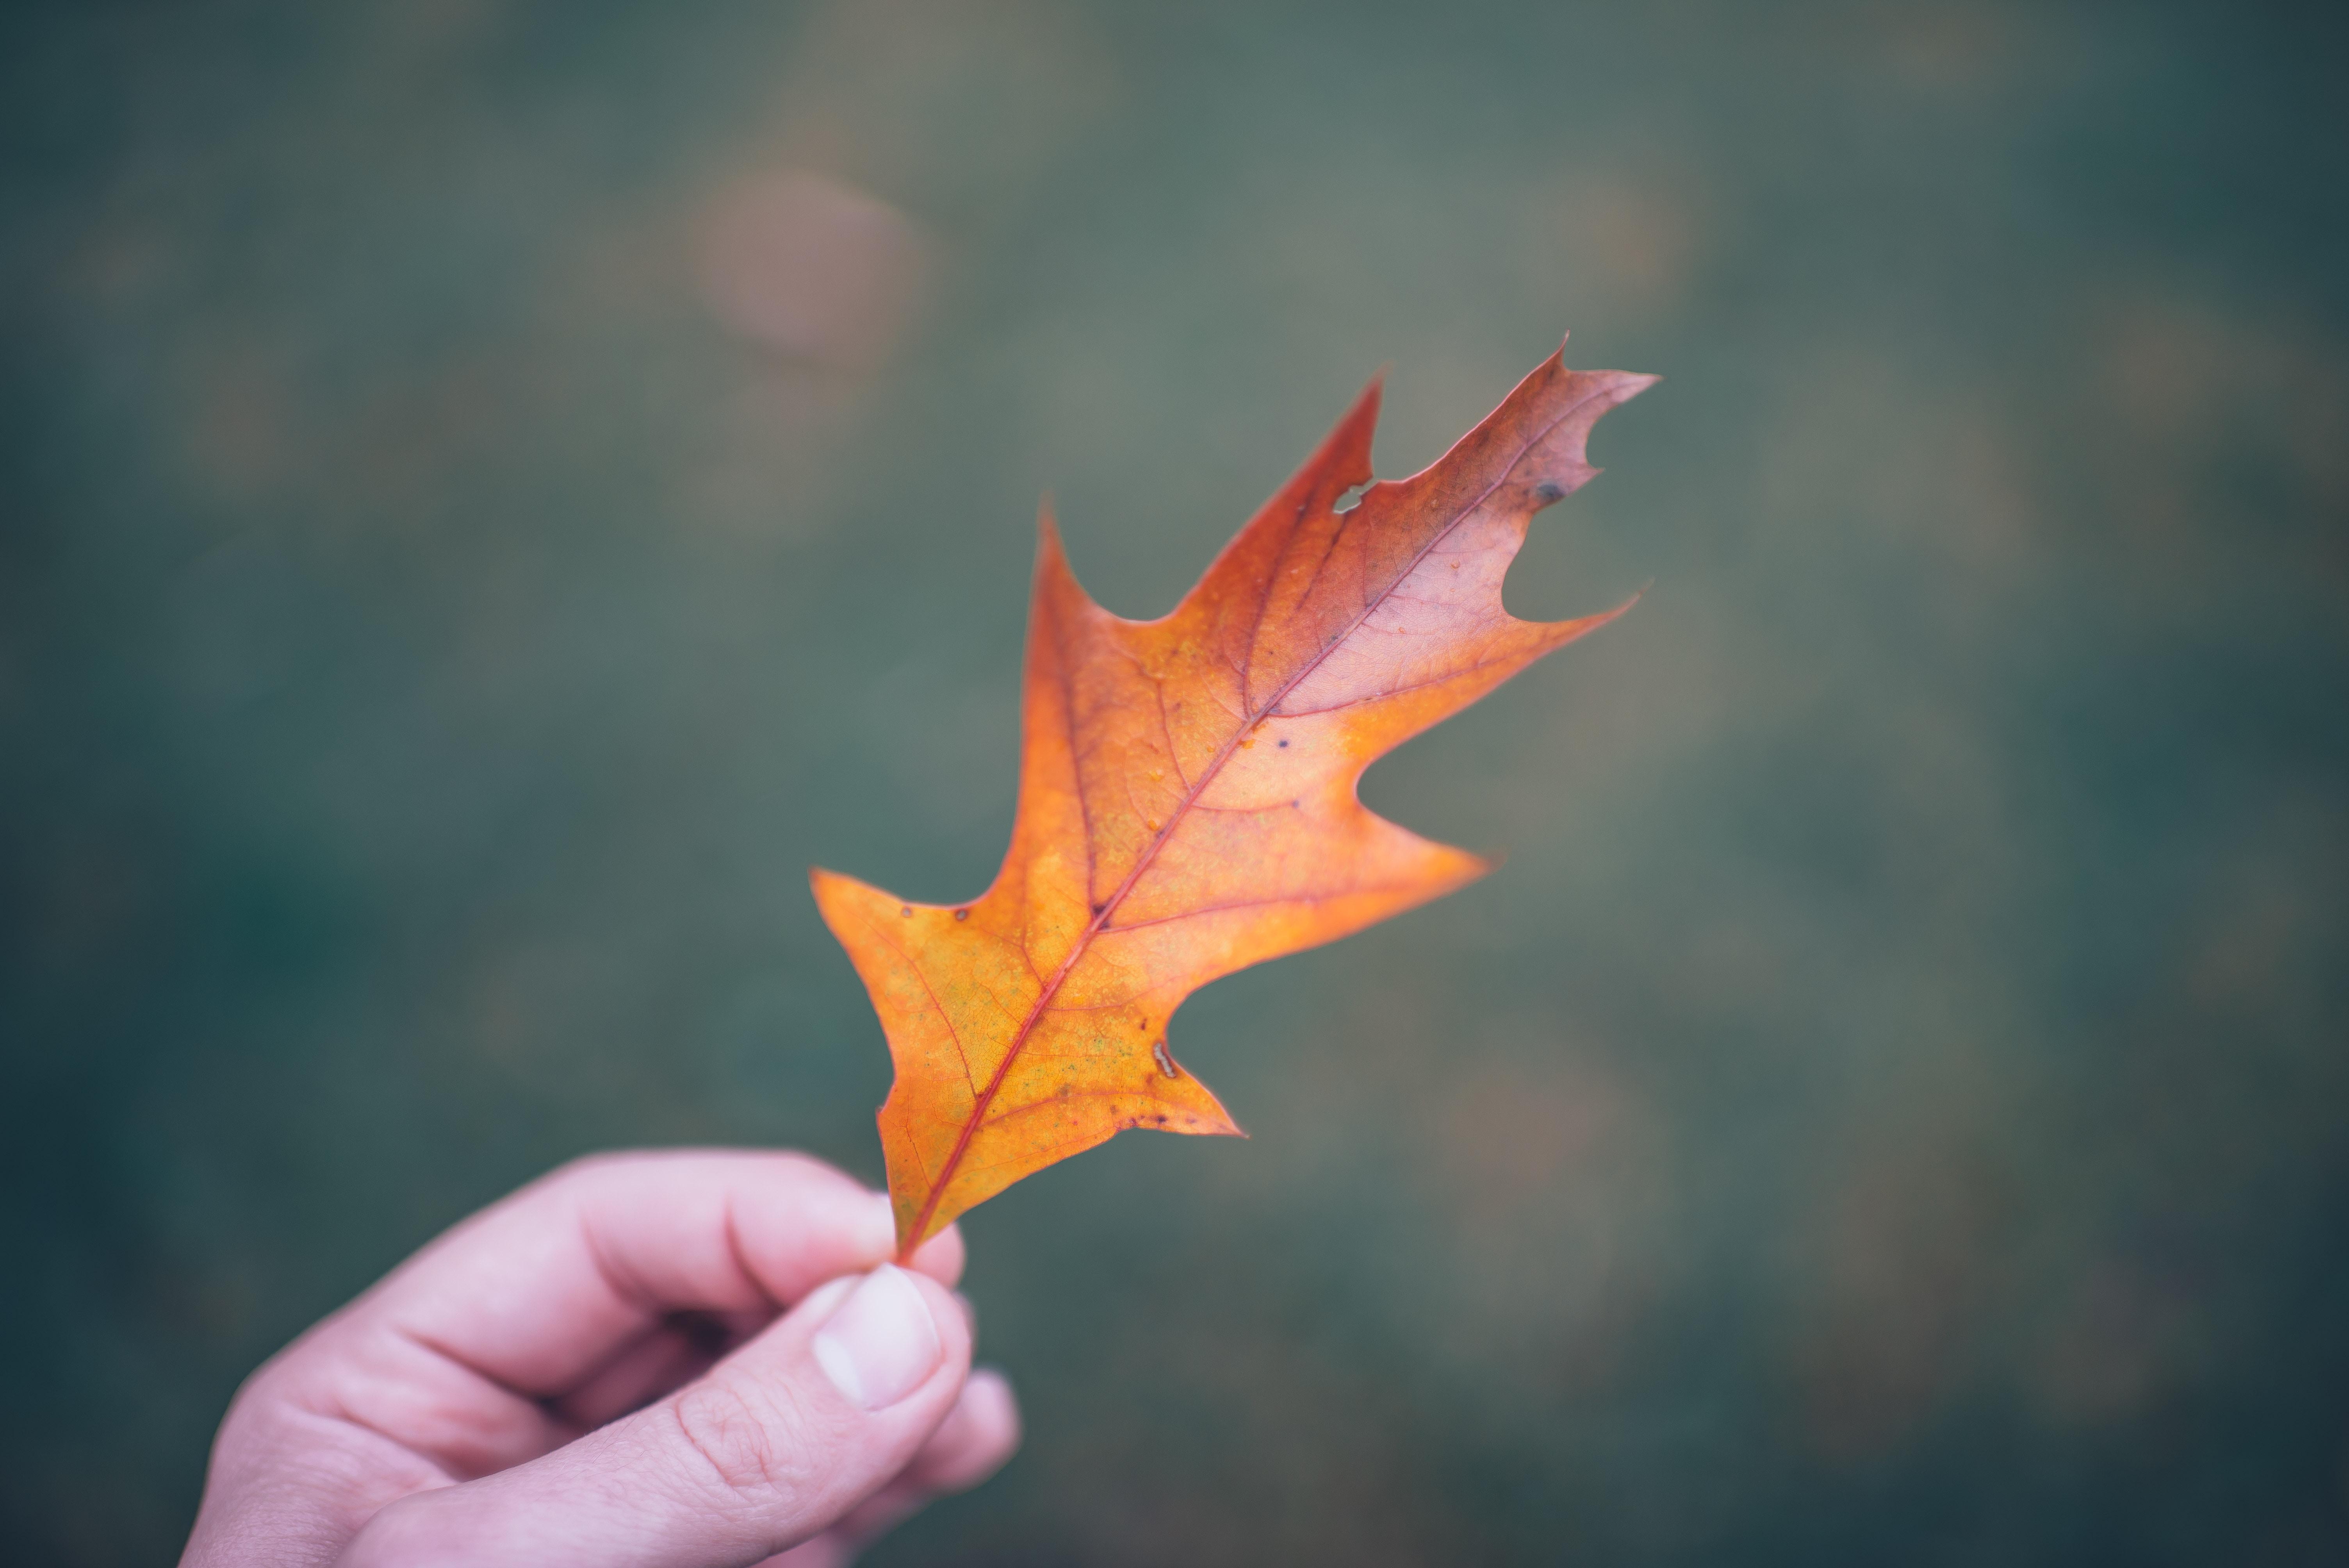 A person holding an orange leaf.